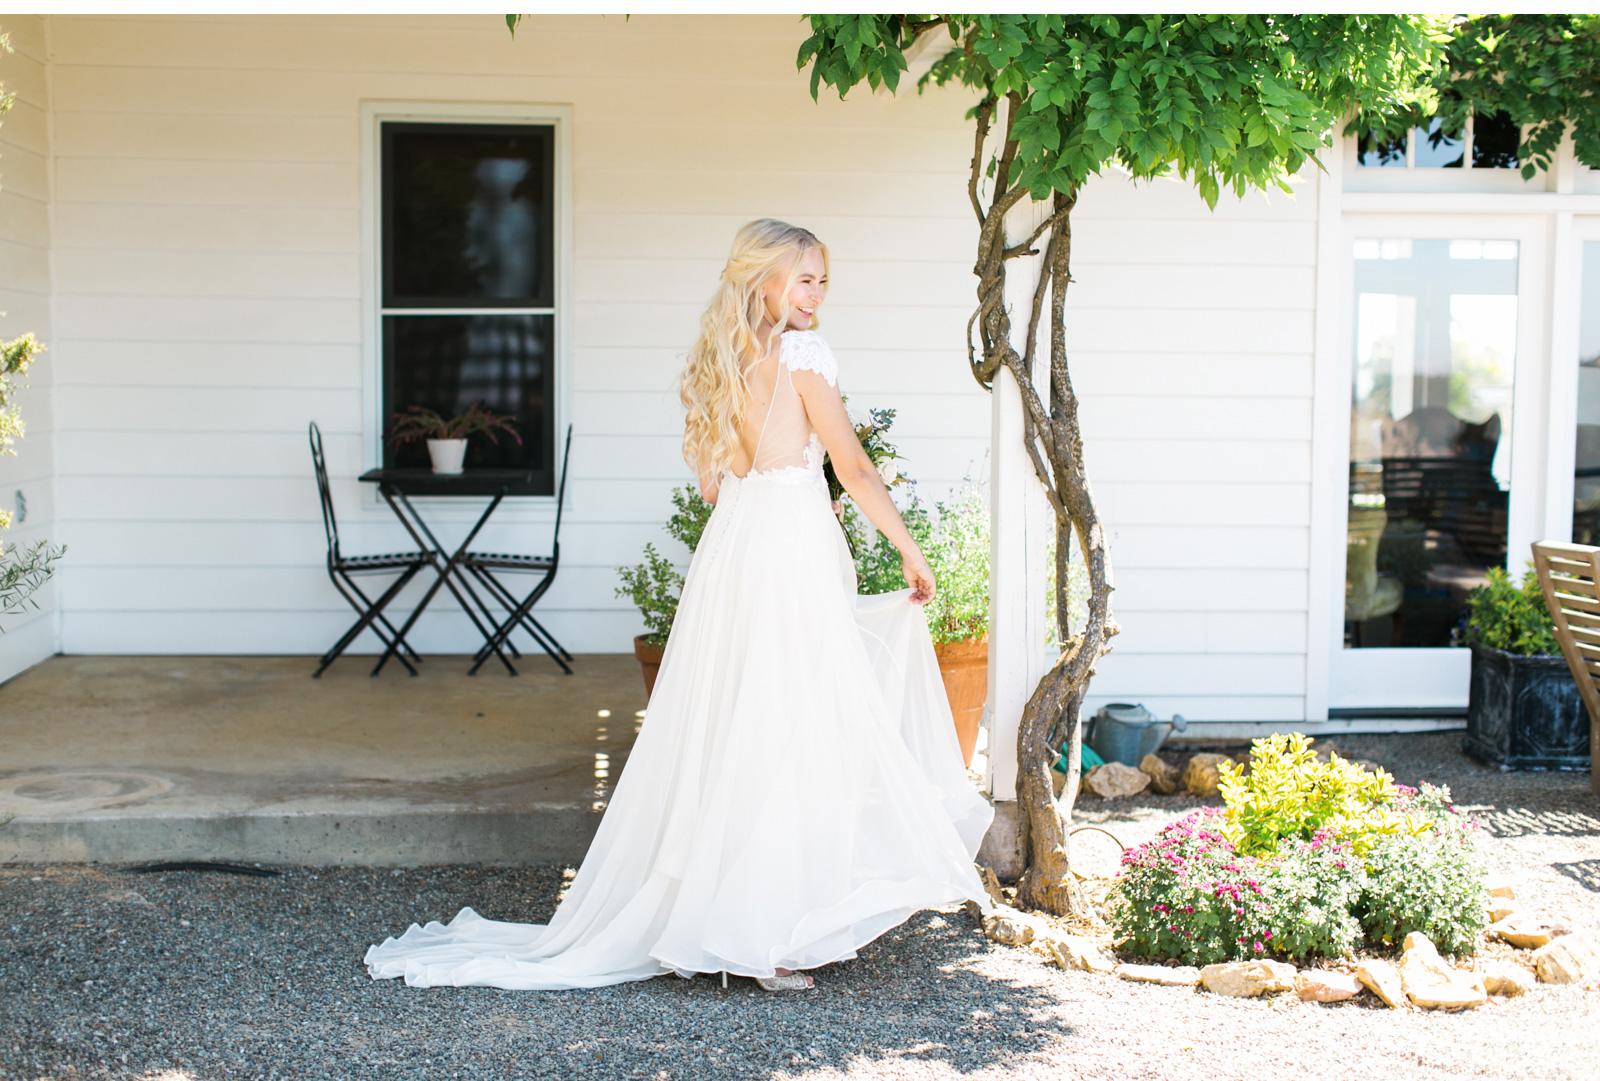 Santa-Barbara-Style-Me-Pretty-Wedding-Natalie-Schutt-Photography_11.jpg